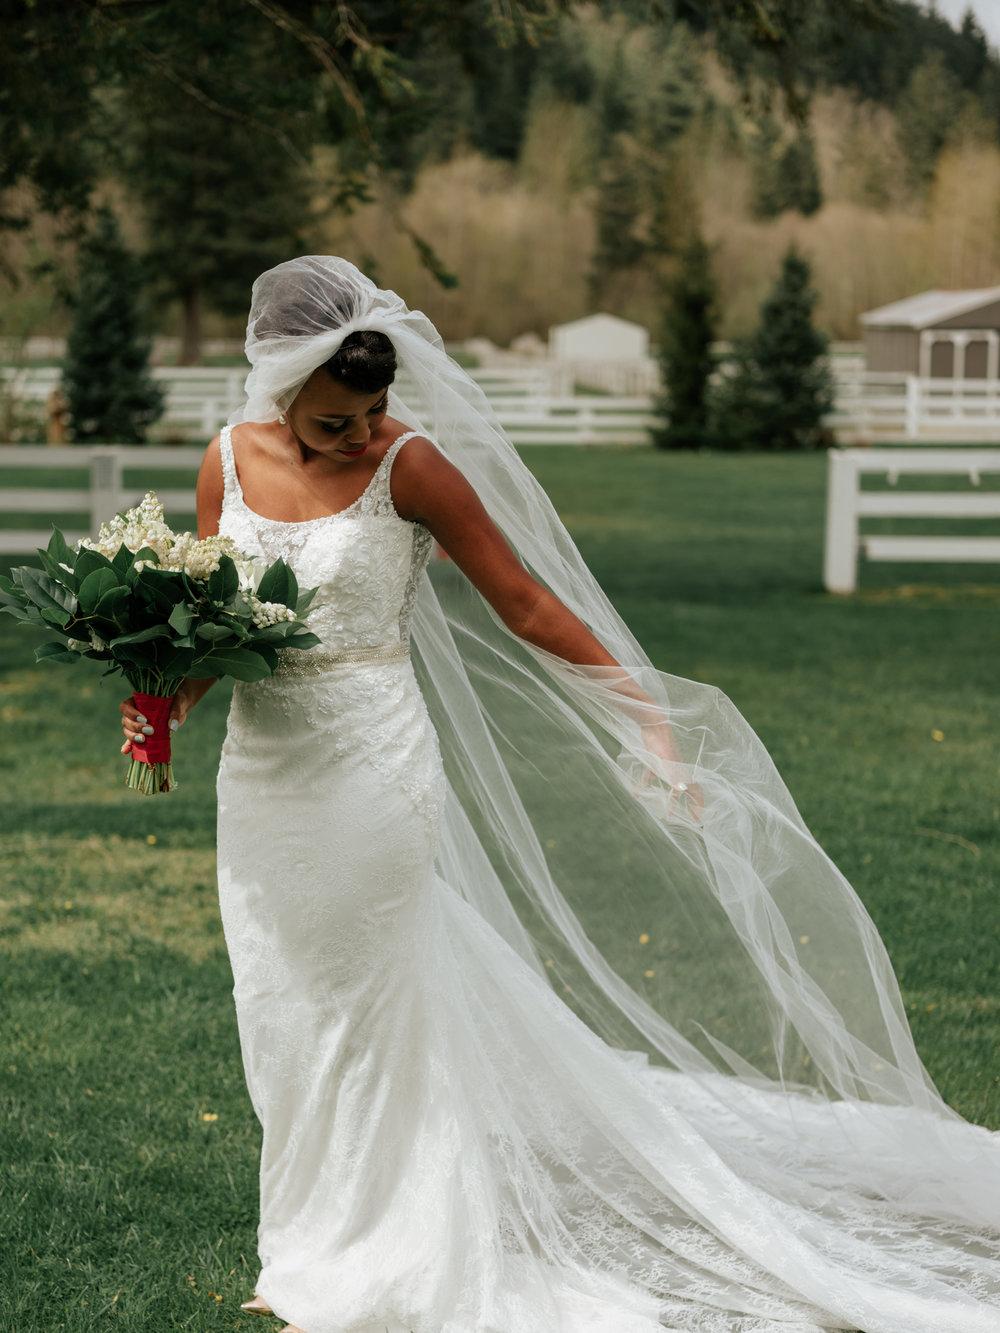 Stolen Glimpses Seattle Wedding Photographer at Rein Fire Ranch 7.jpg